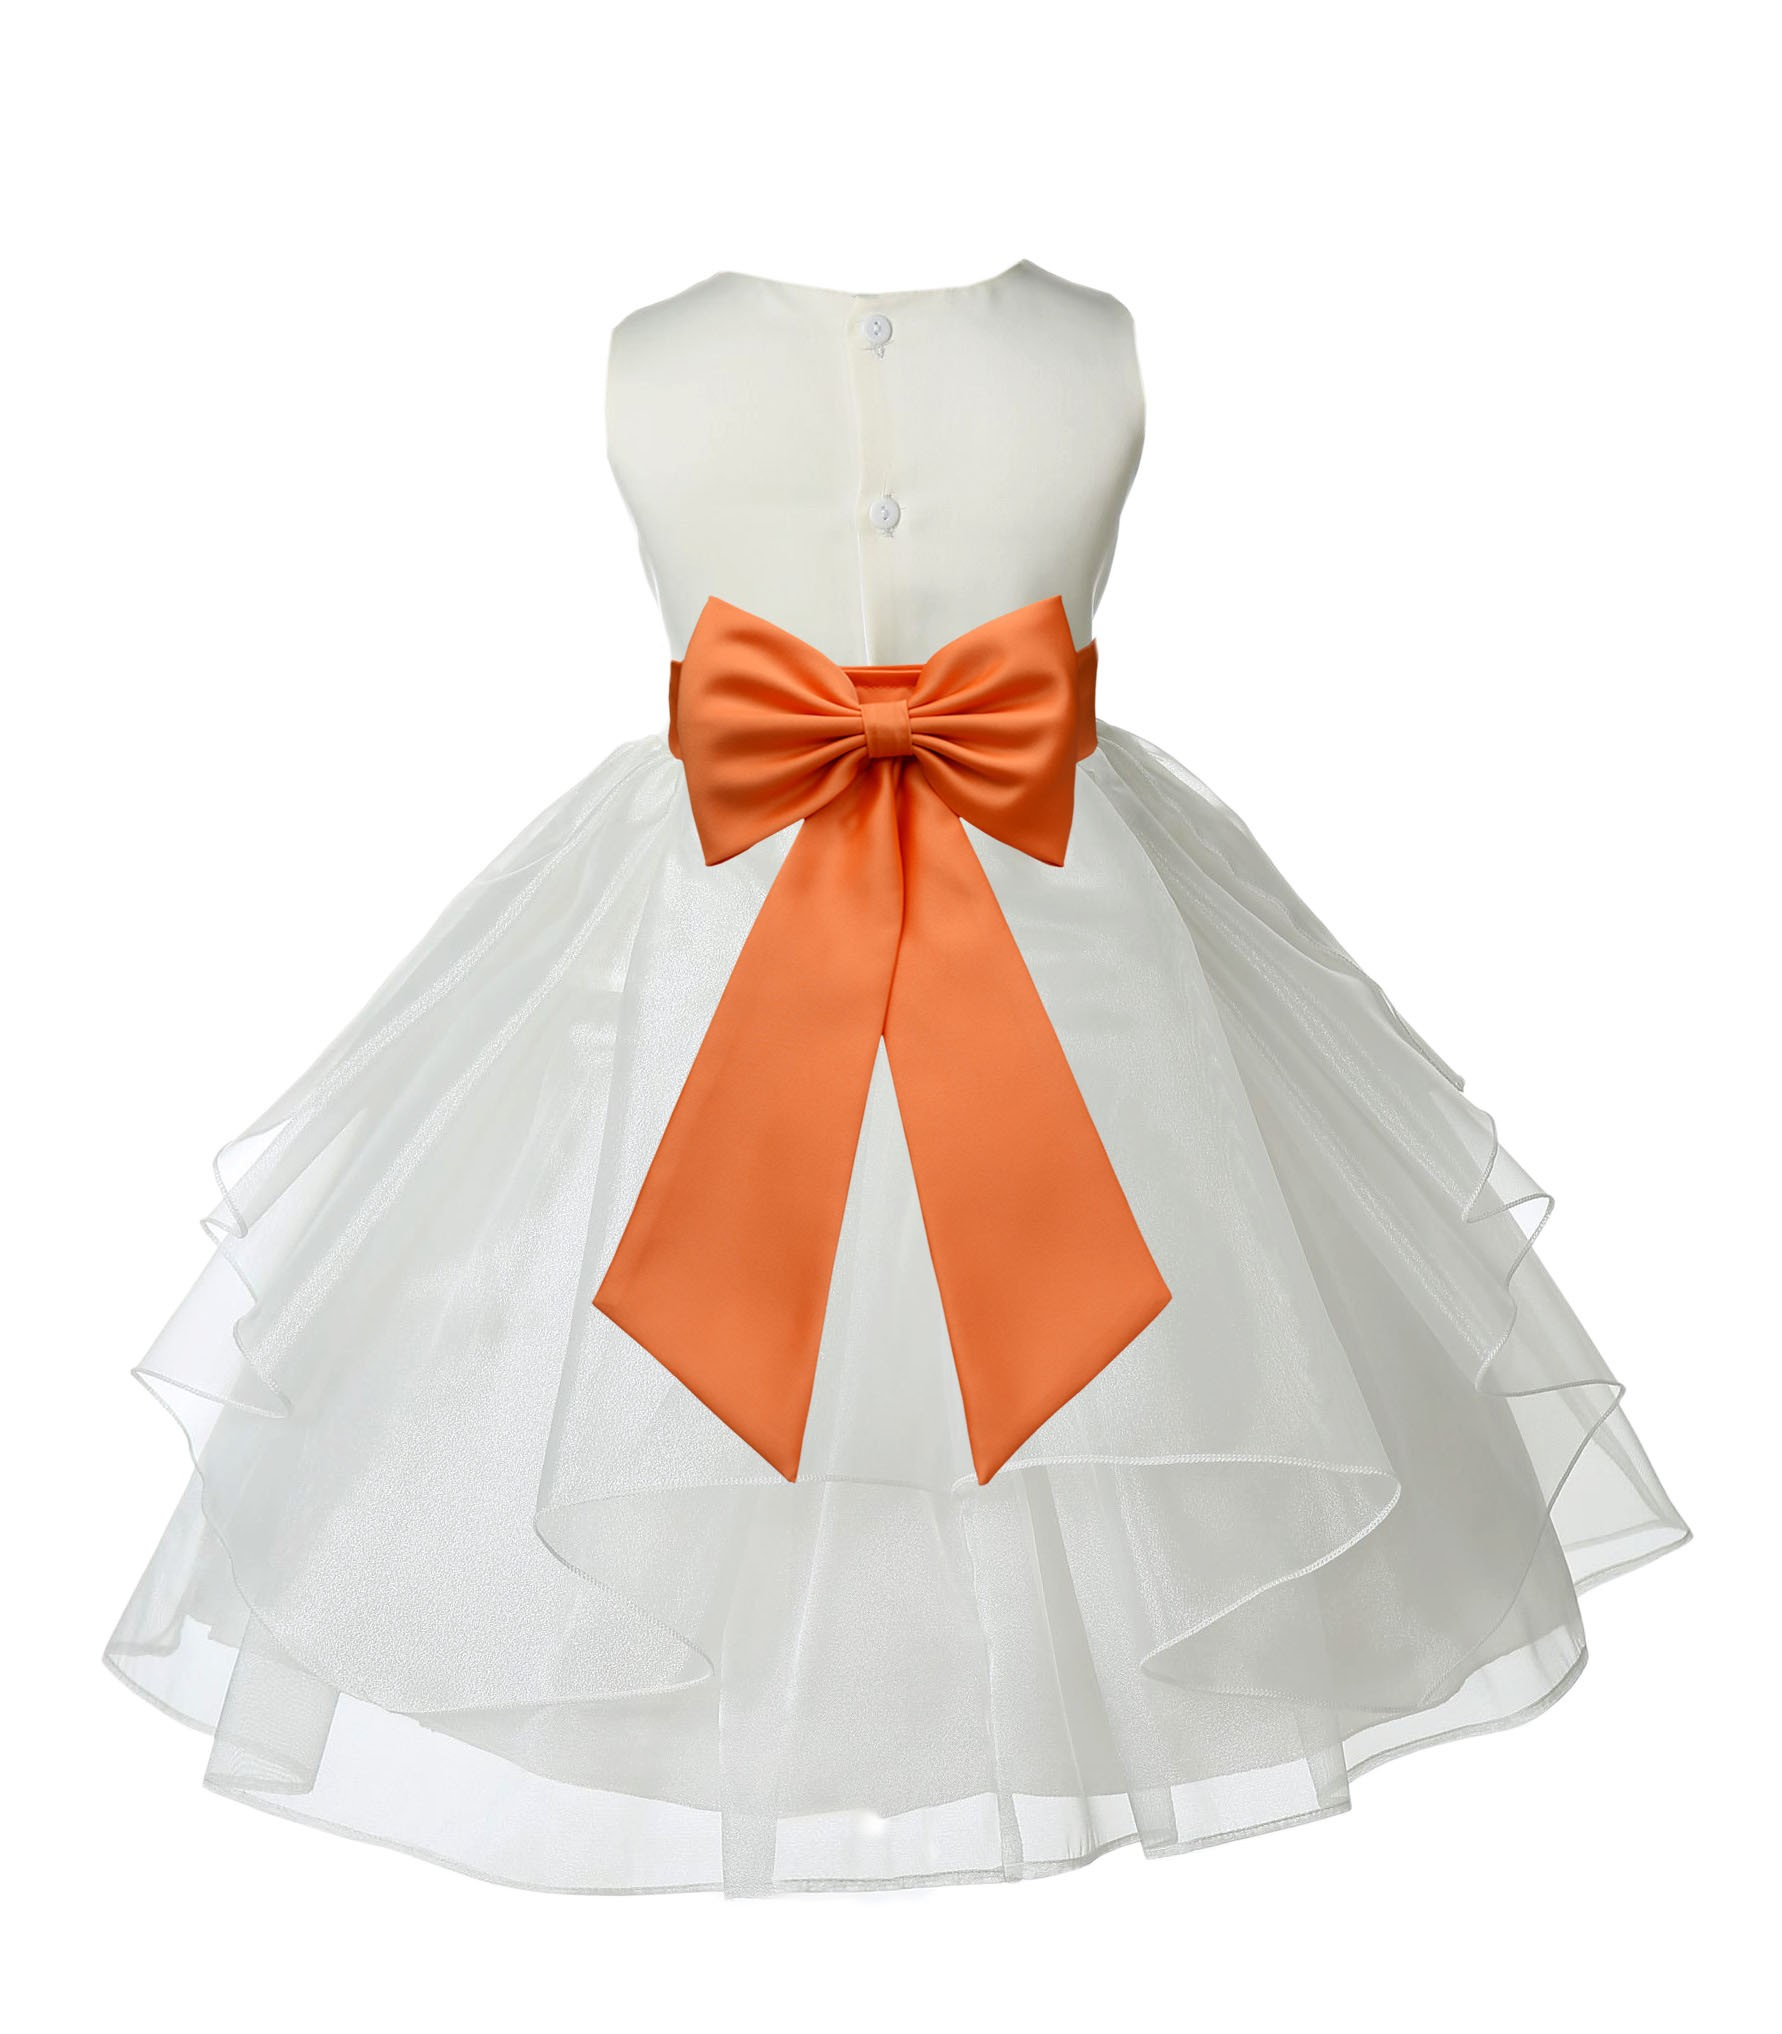 Ivoryorange Satin Shimmering Organza Flower Girl Dress Wedding